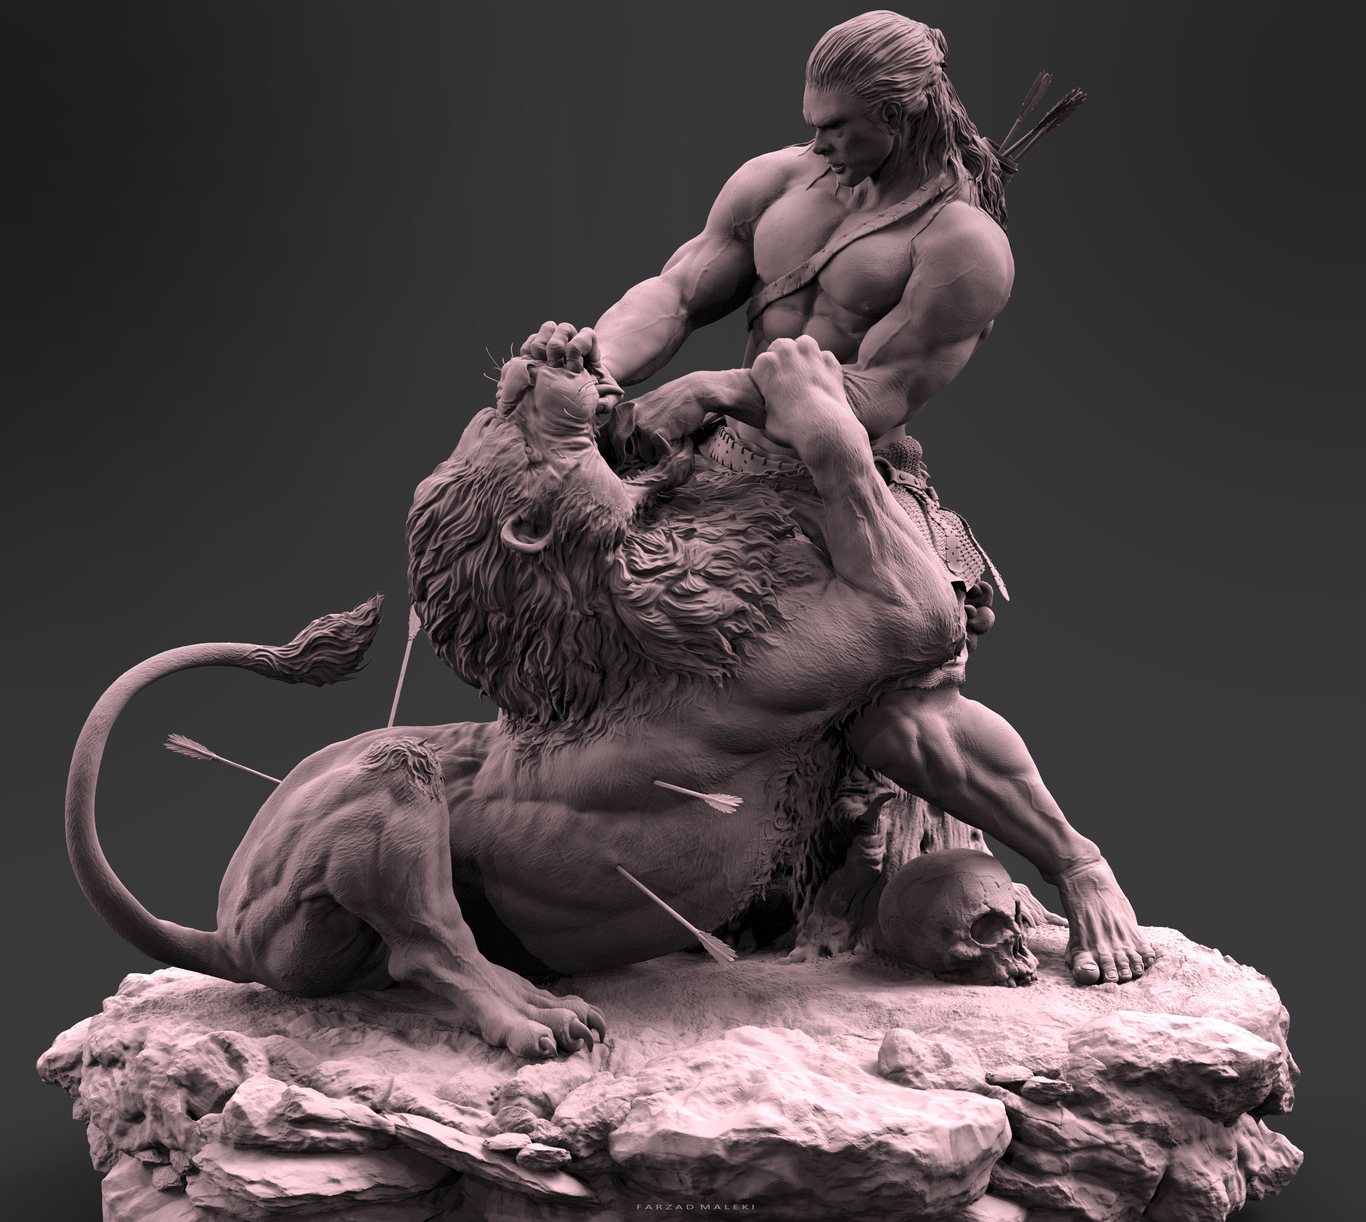 Komododragon samson and the lion 1 8e453216 qzjo